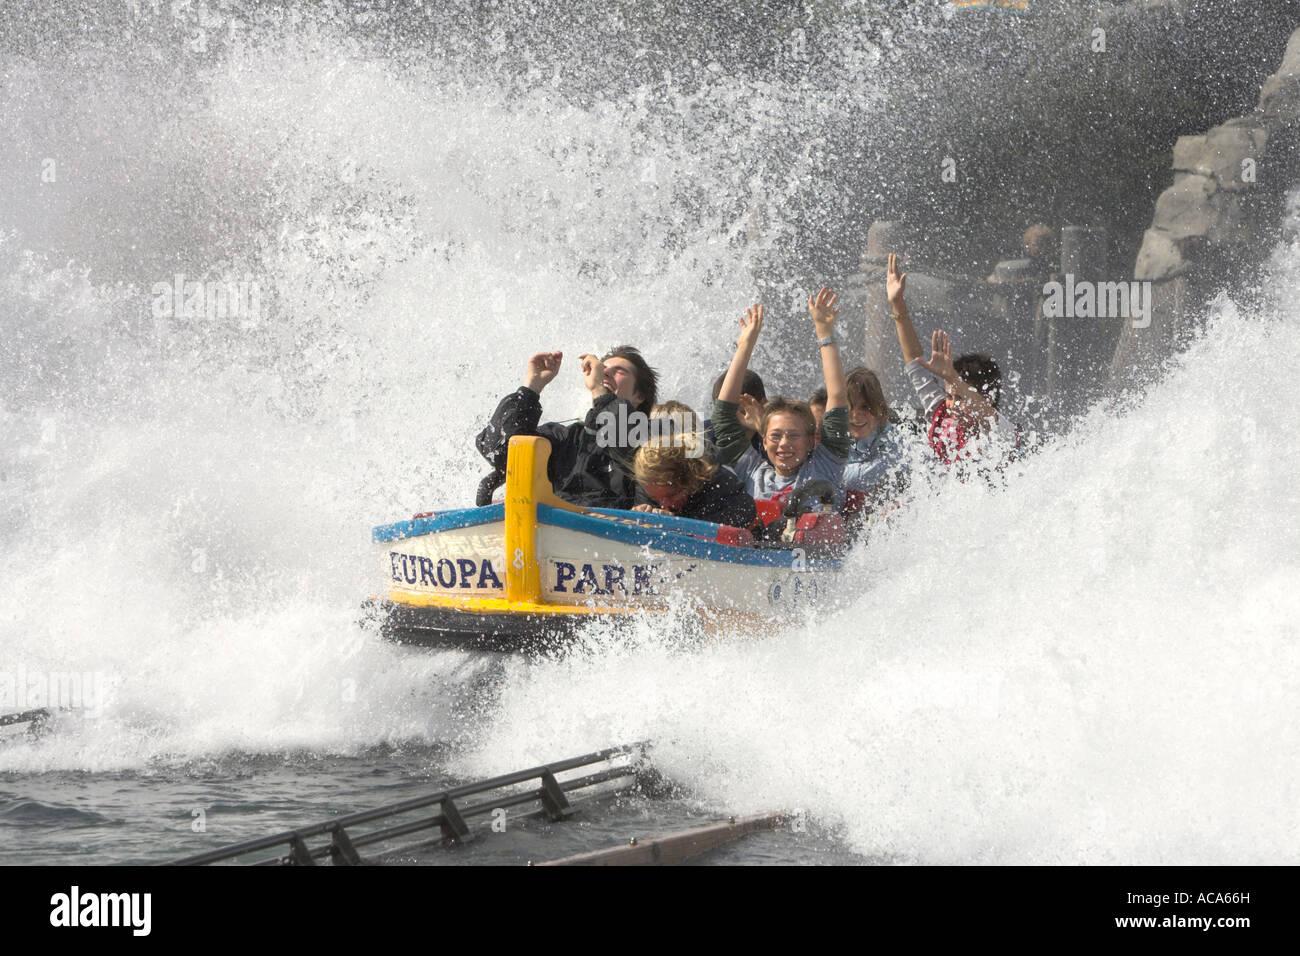 Water roller coaster poseidon, Europa park Rust, Bade-Wuerttemberg, Germany Stock Photo